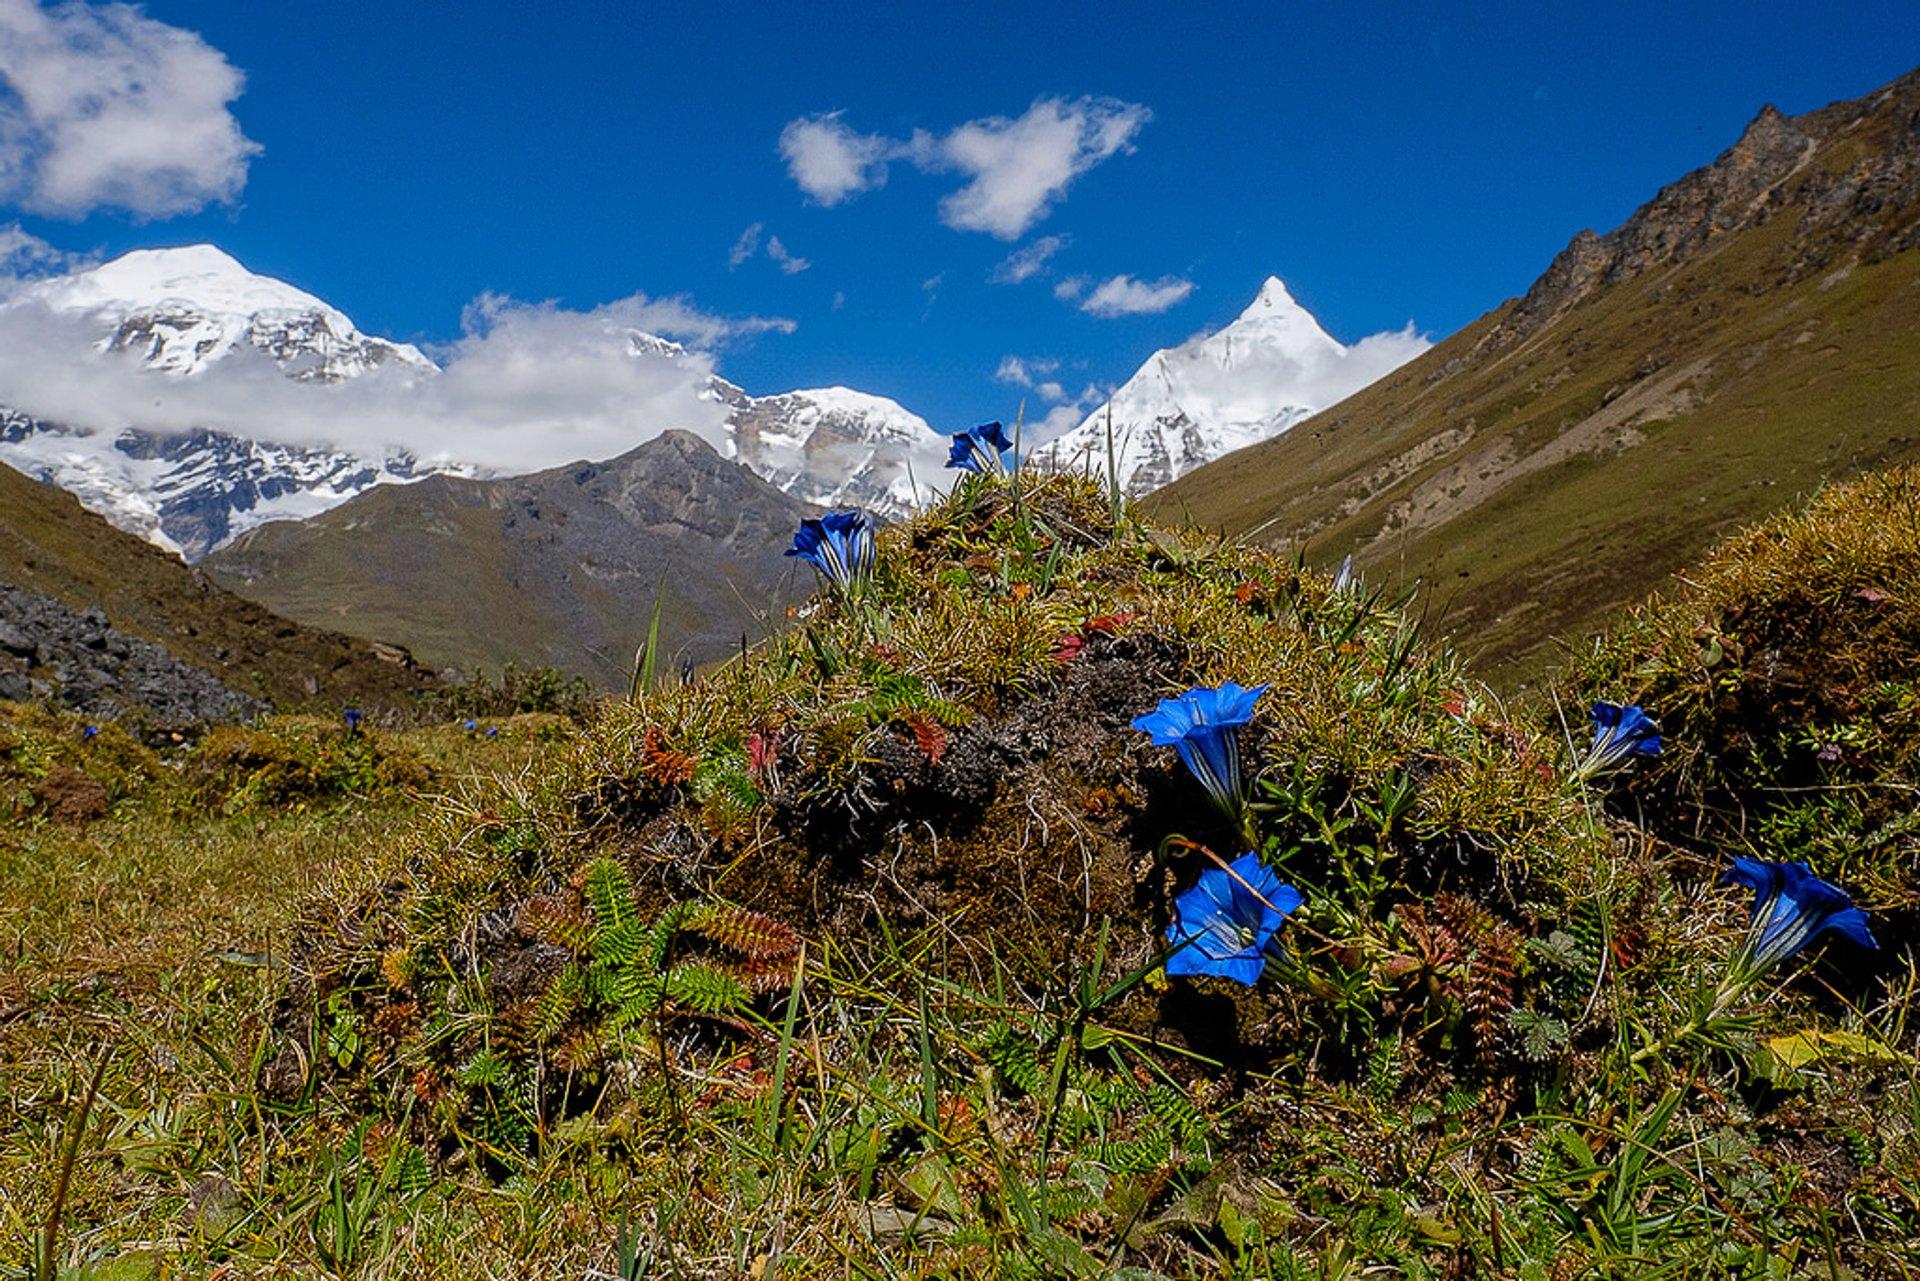 Edelweiss and Gentian Blooming Season in Bhutan 2019 - Best Time